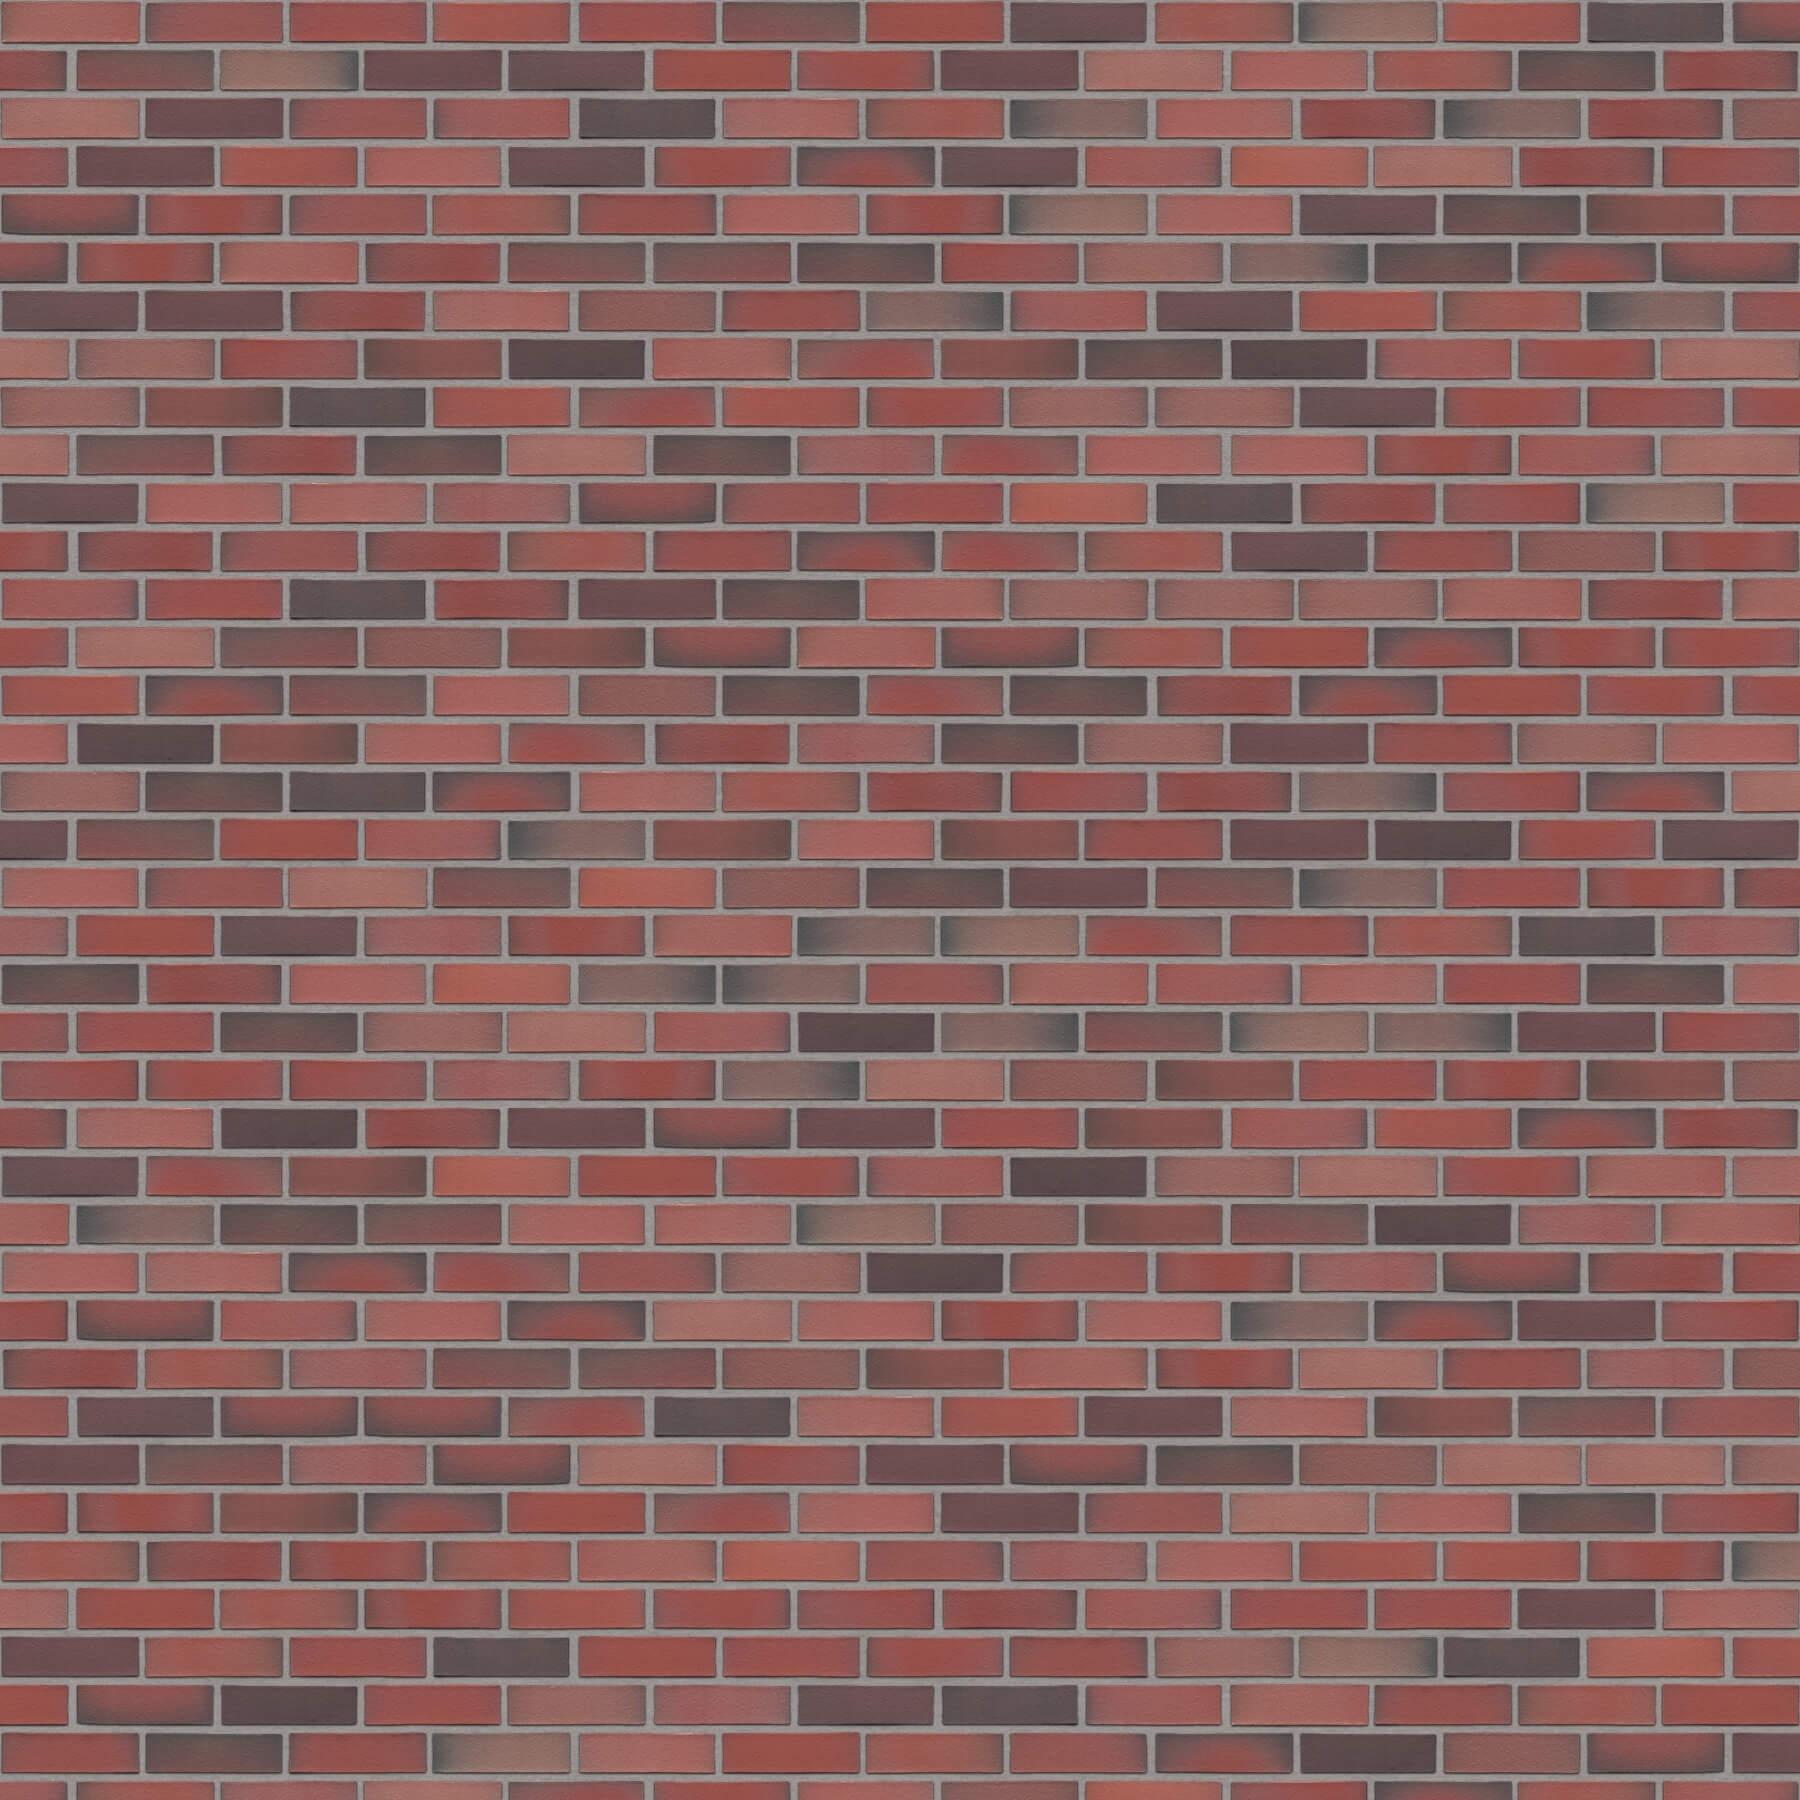 Puna-cigla-Feldhaus-Klinker-brick-house-nf-k-300-Siva Fuga